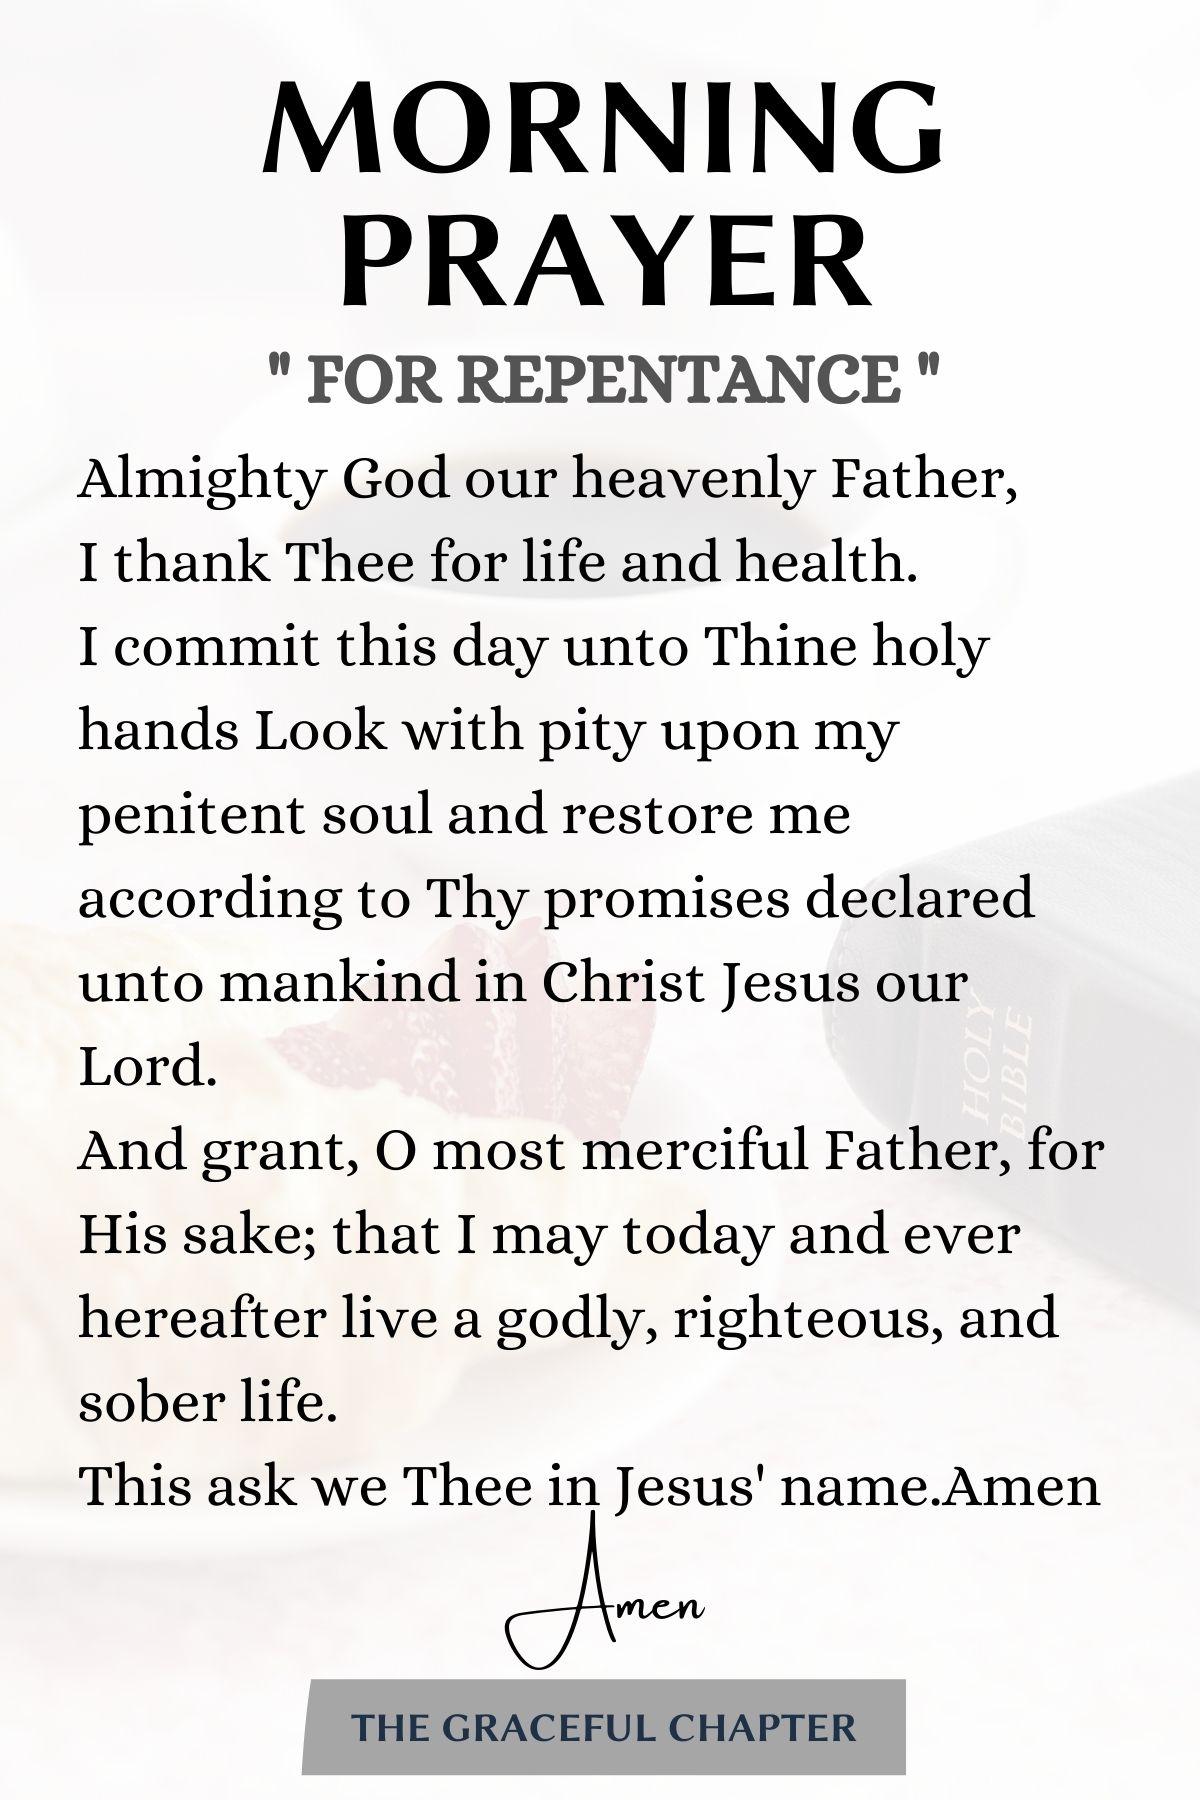 prayer for repentance